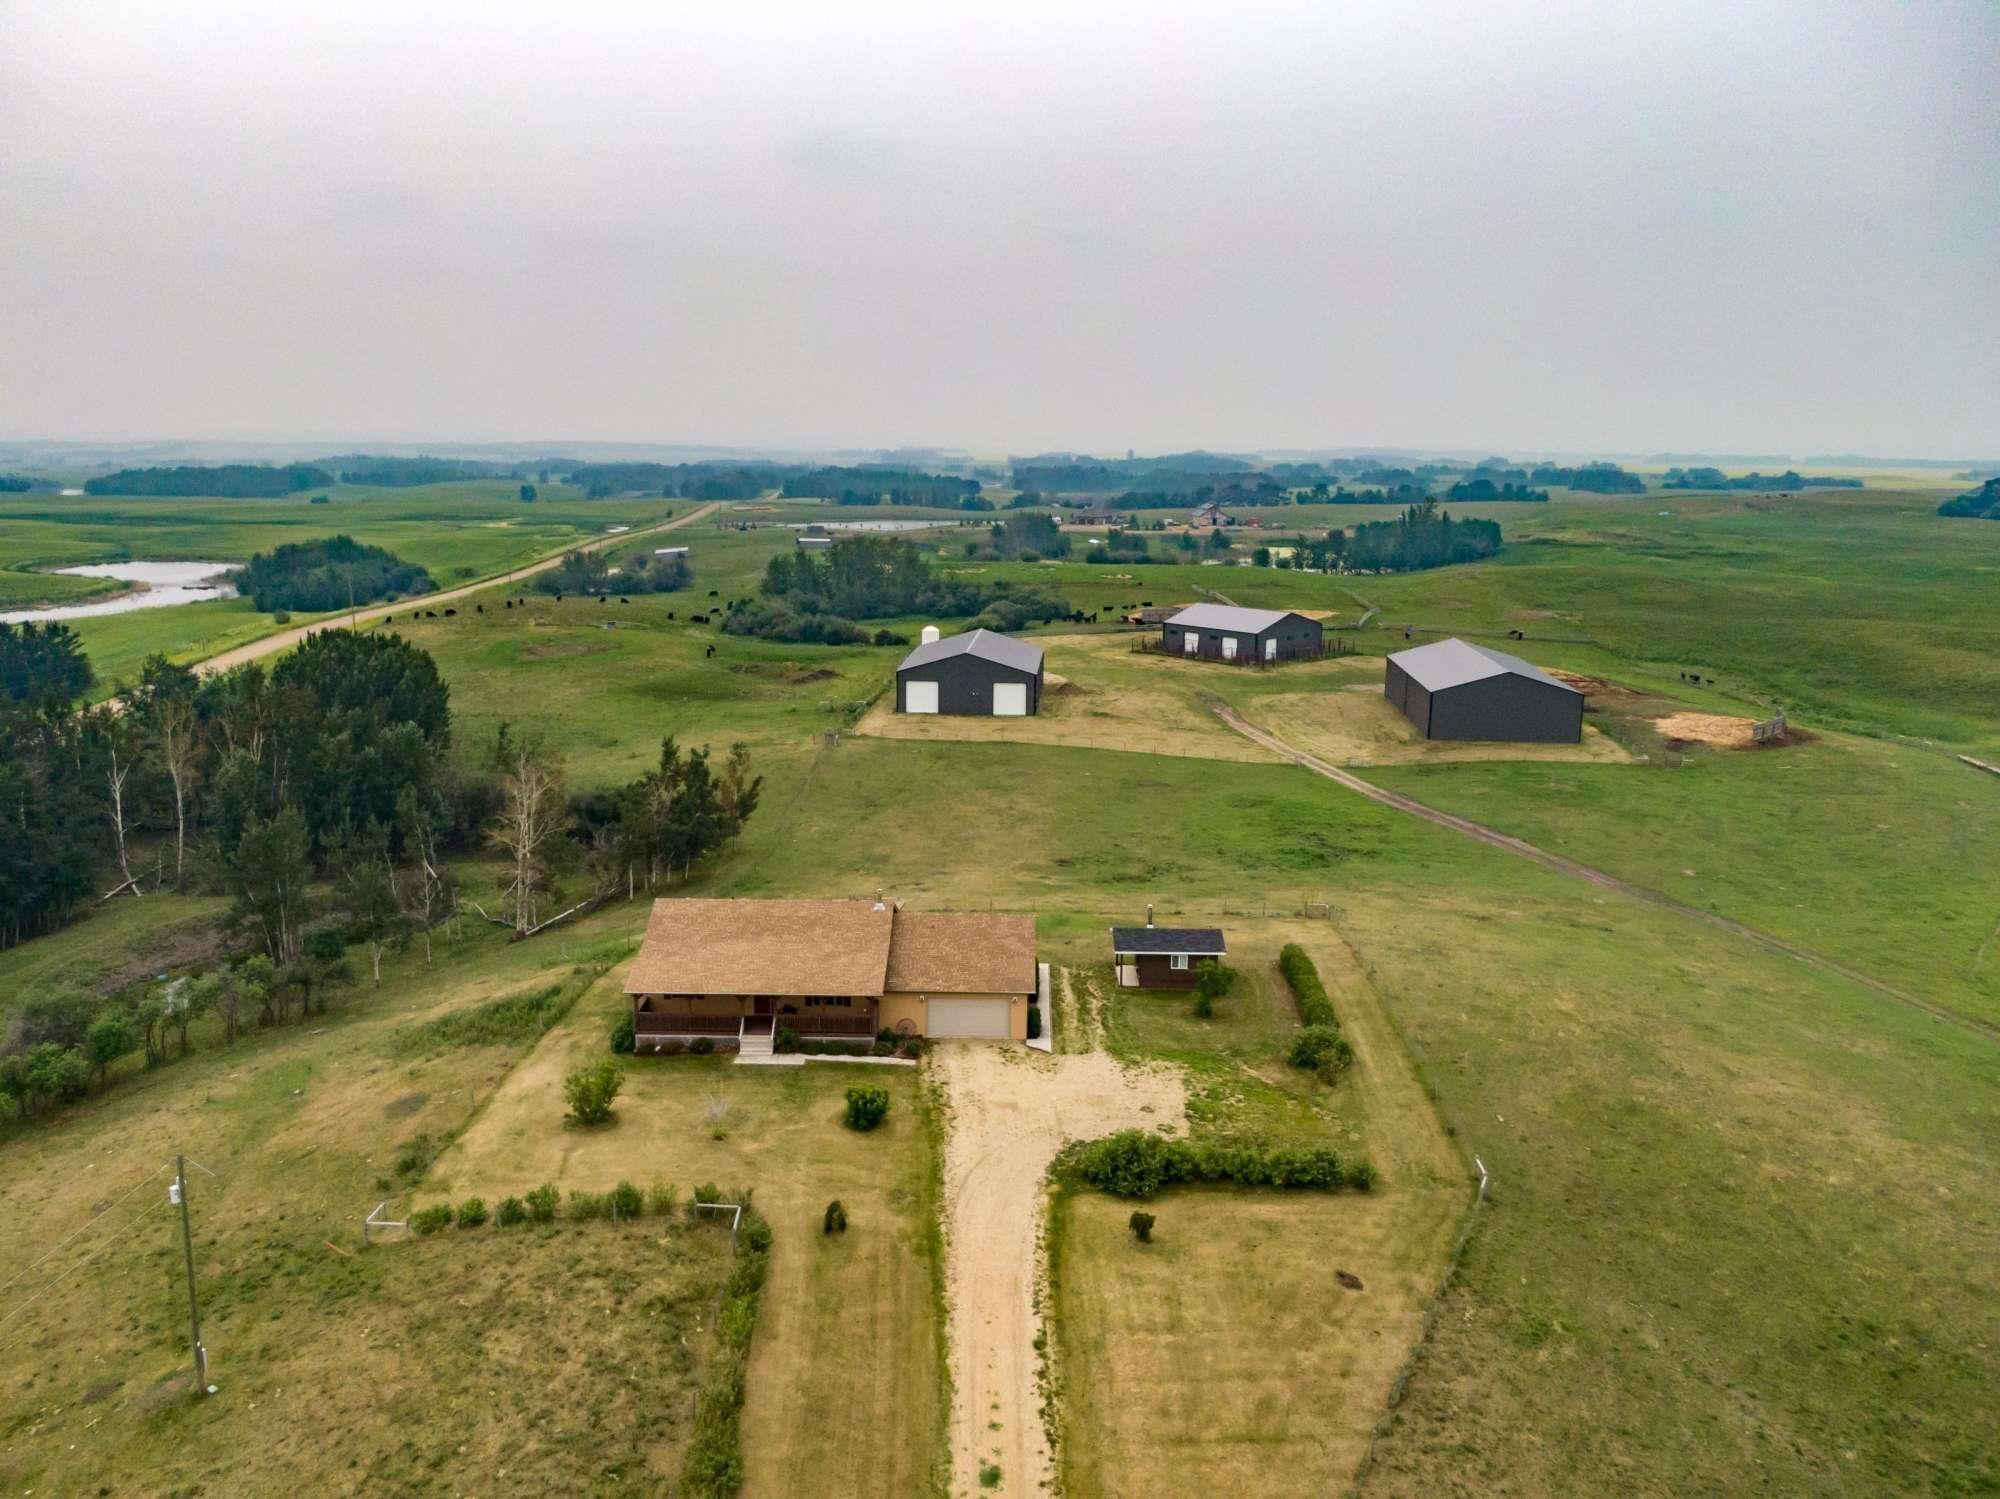 Main Photo: 224005 Twp 470: Rural Wetaskiwin County House for sale : MLS®# E4255474